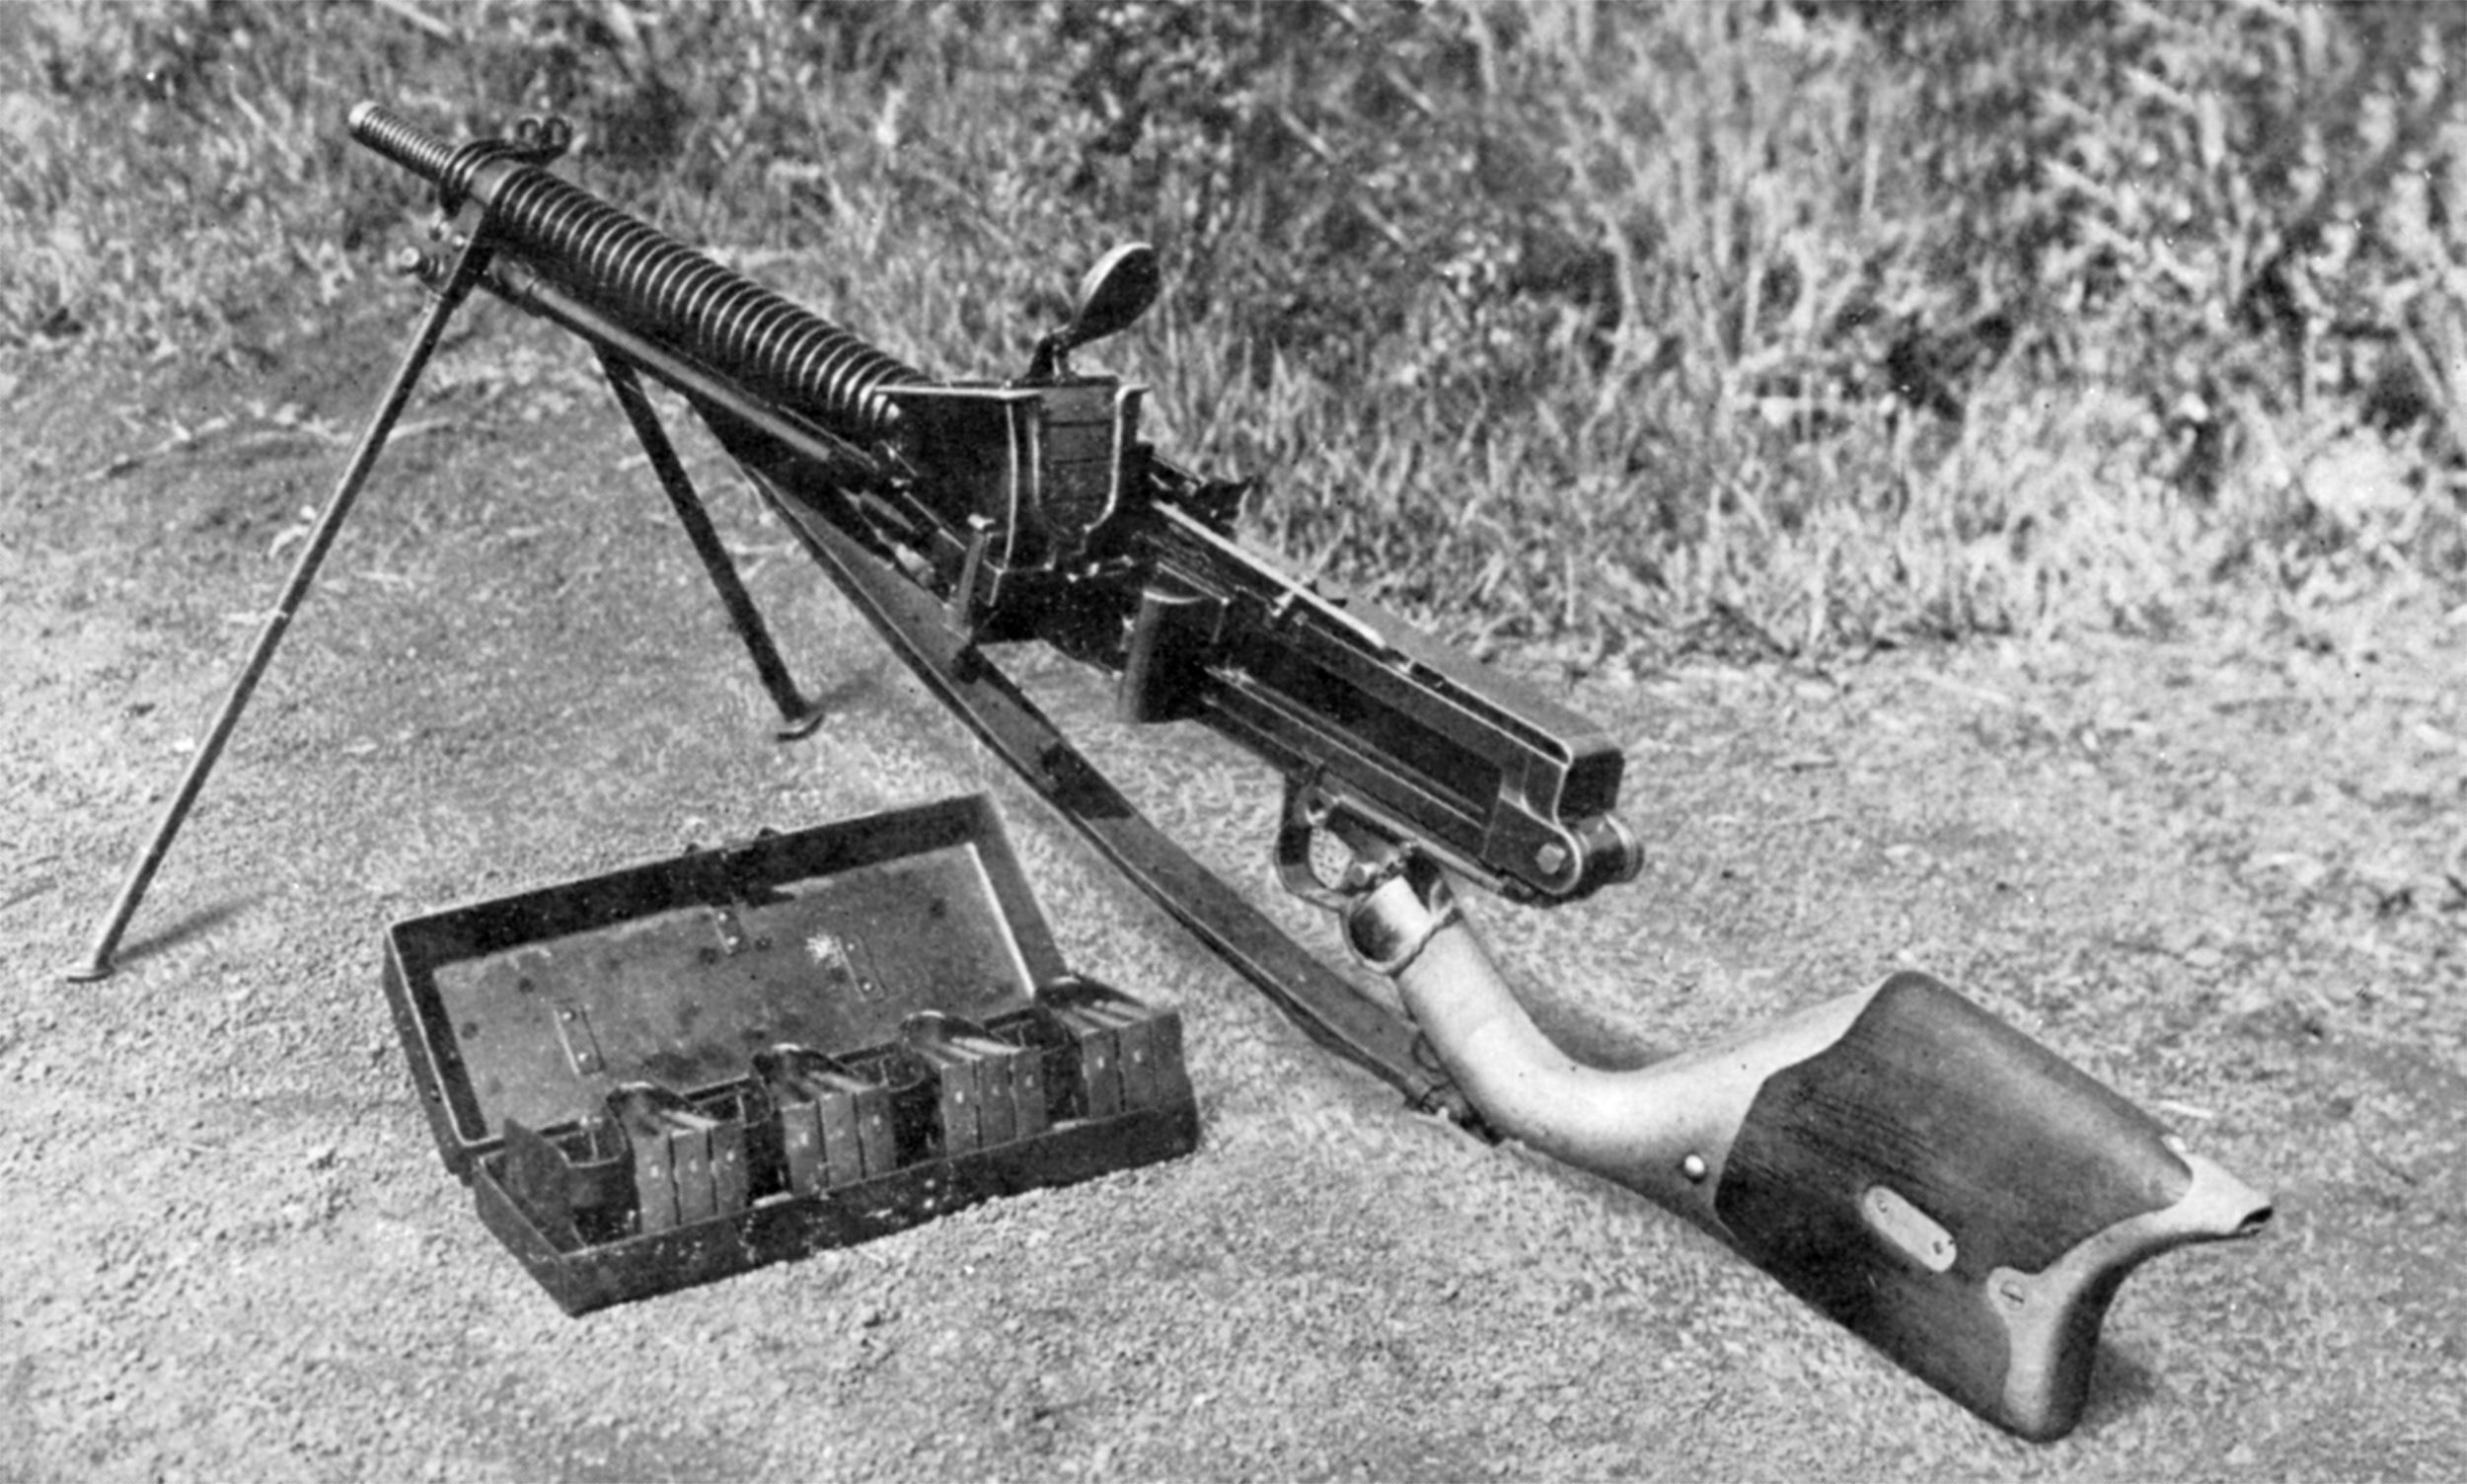 Ametralladora Ligera Tipo 11 Japanese_Type_11_LMG_from_1933_book